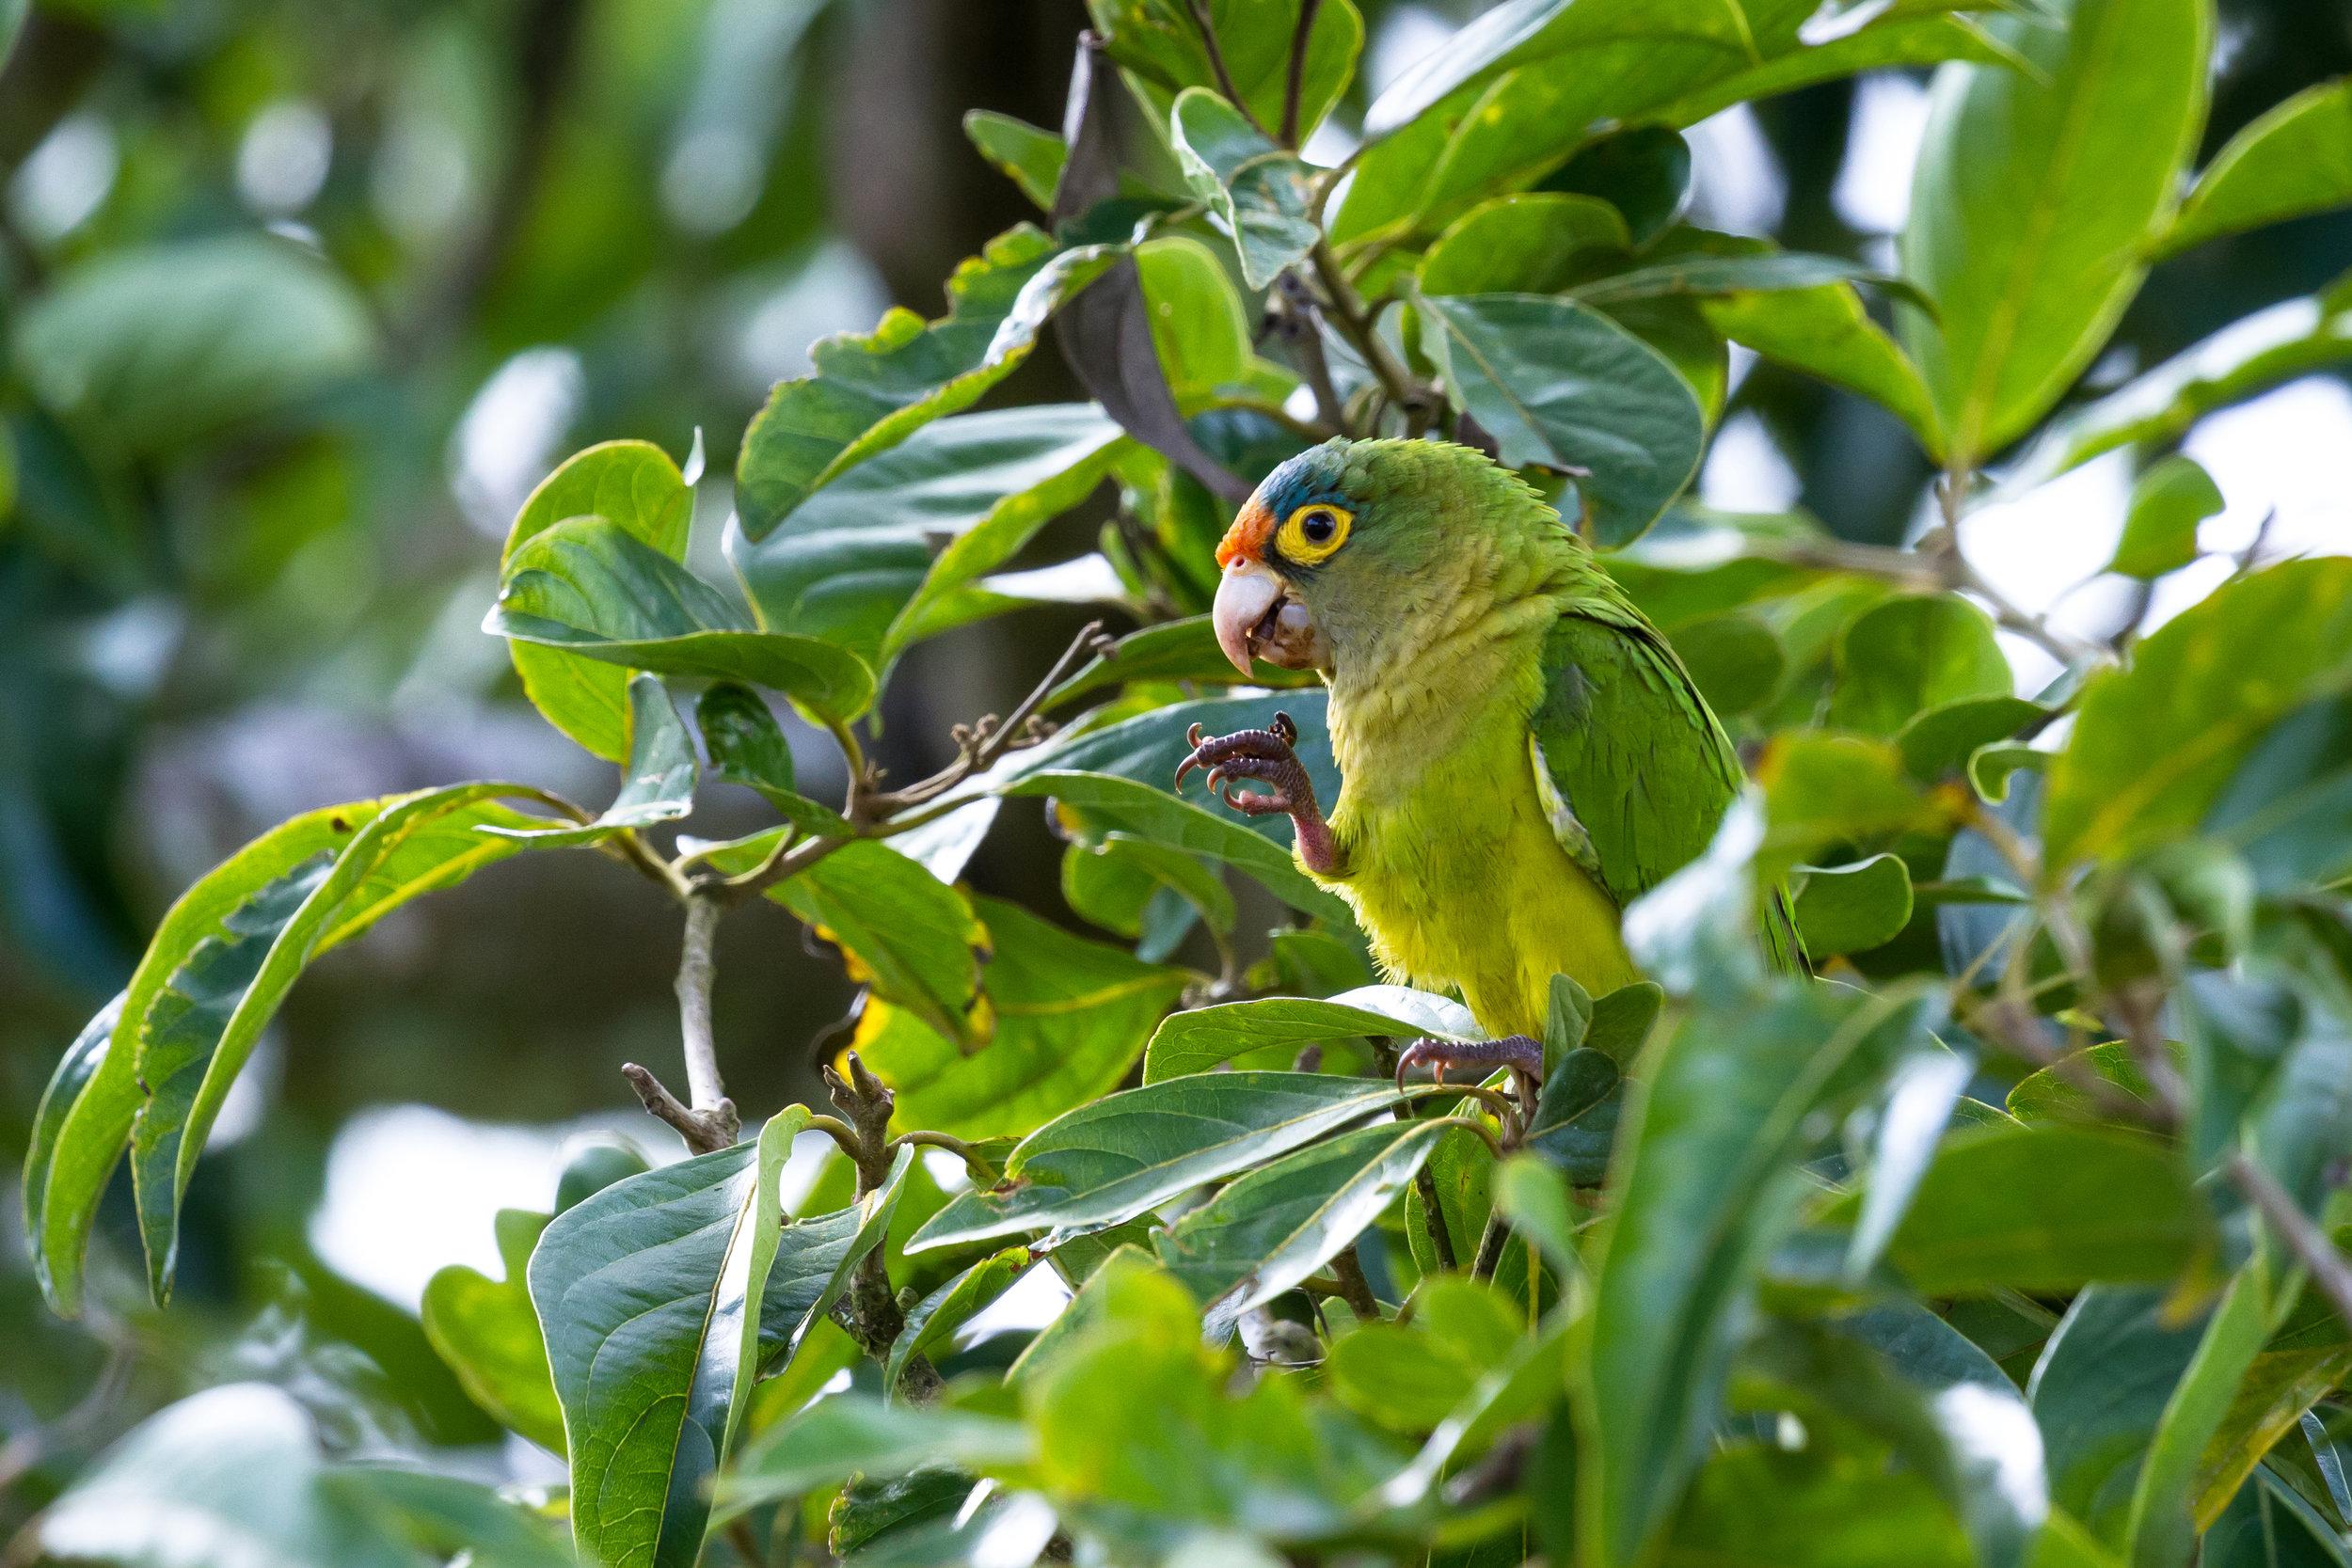 costarica_bigstock-Orange-fronted-Parakeet--Eups-211805380_flip.jpg